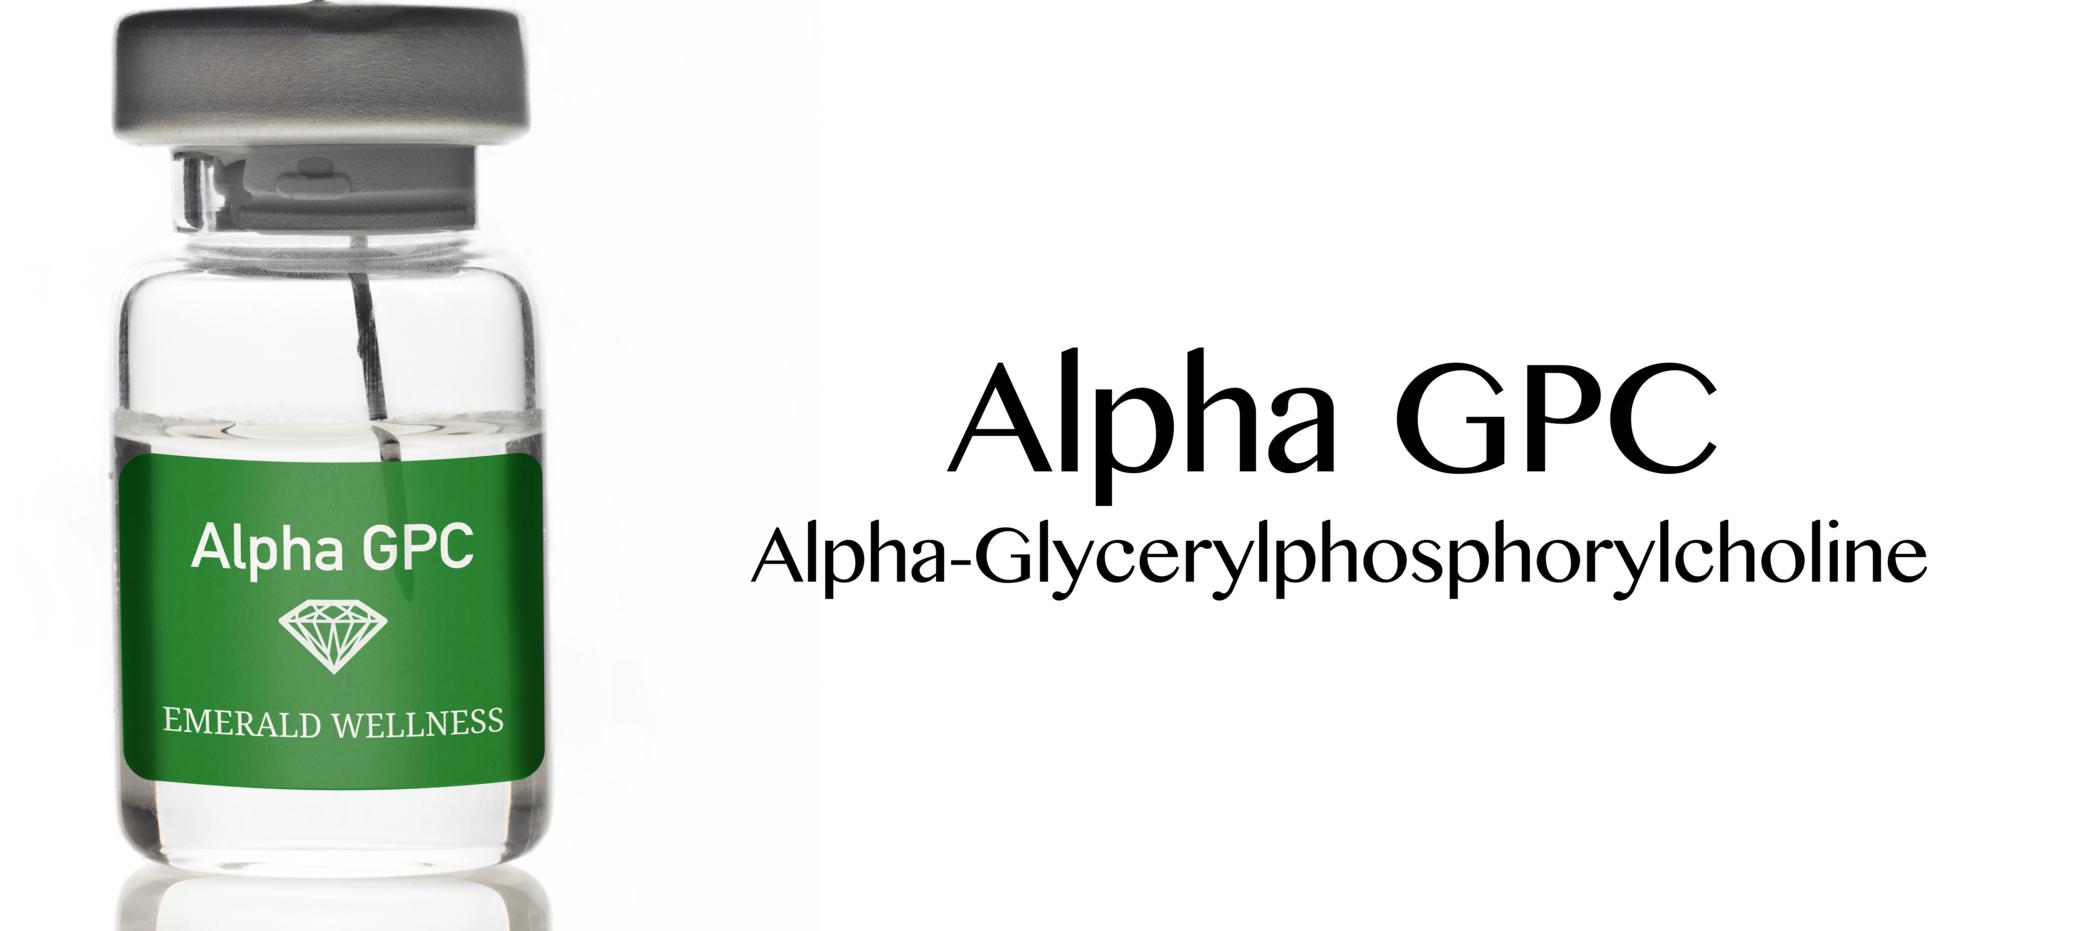 alpha npc IV Therapy Edmonton - Emerald Wellness.png